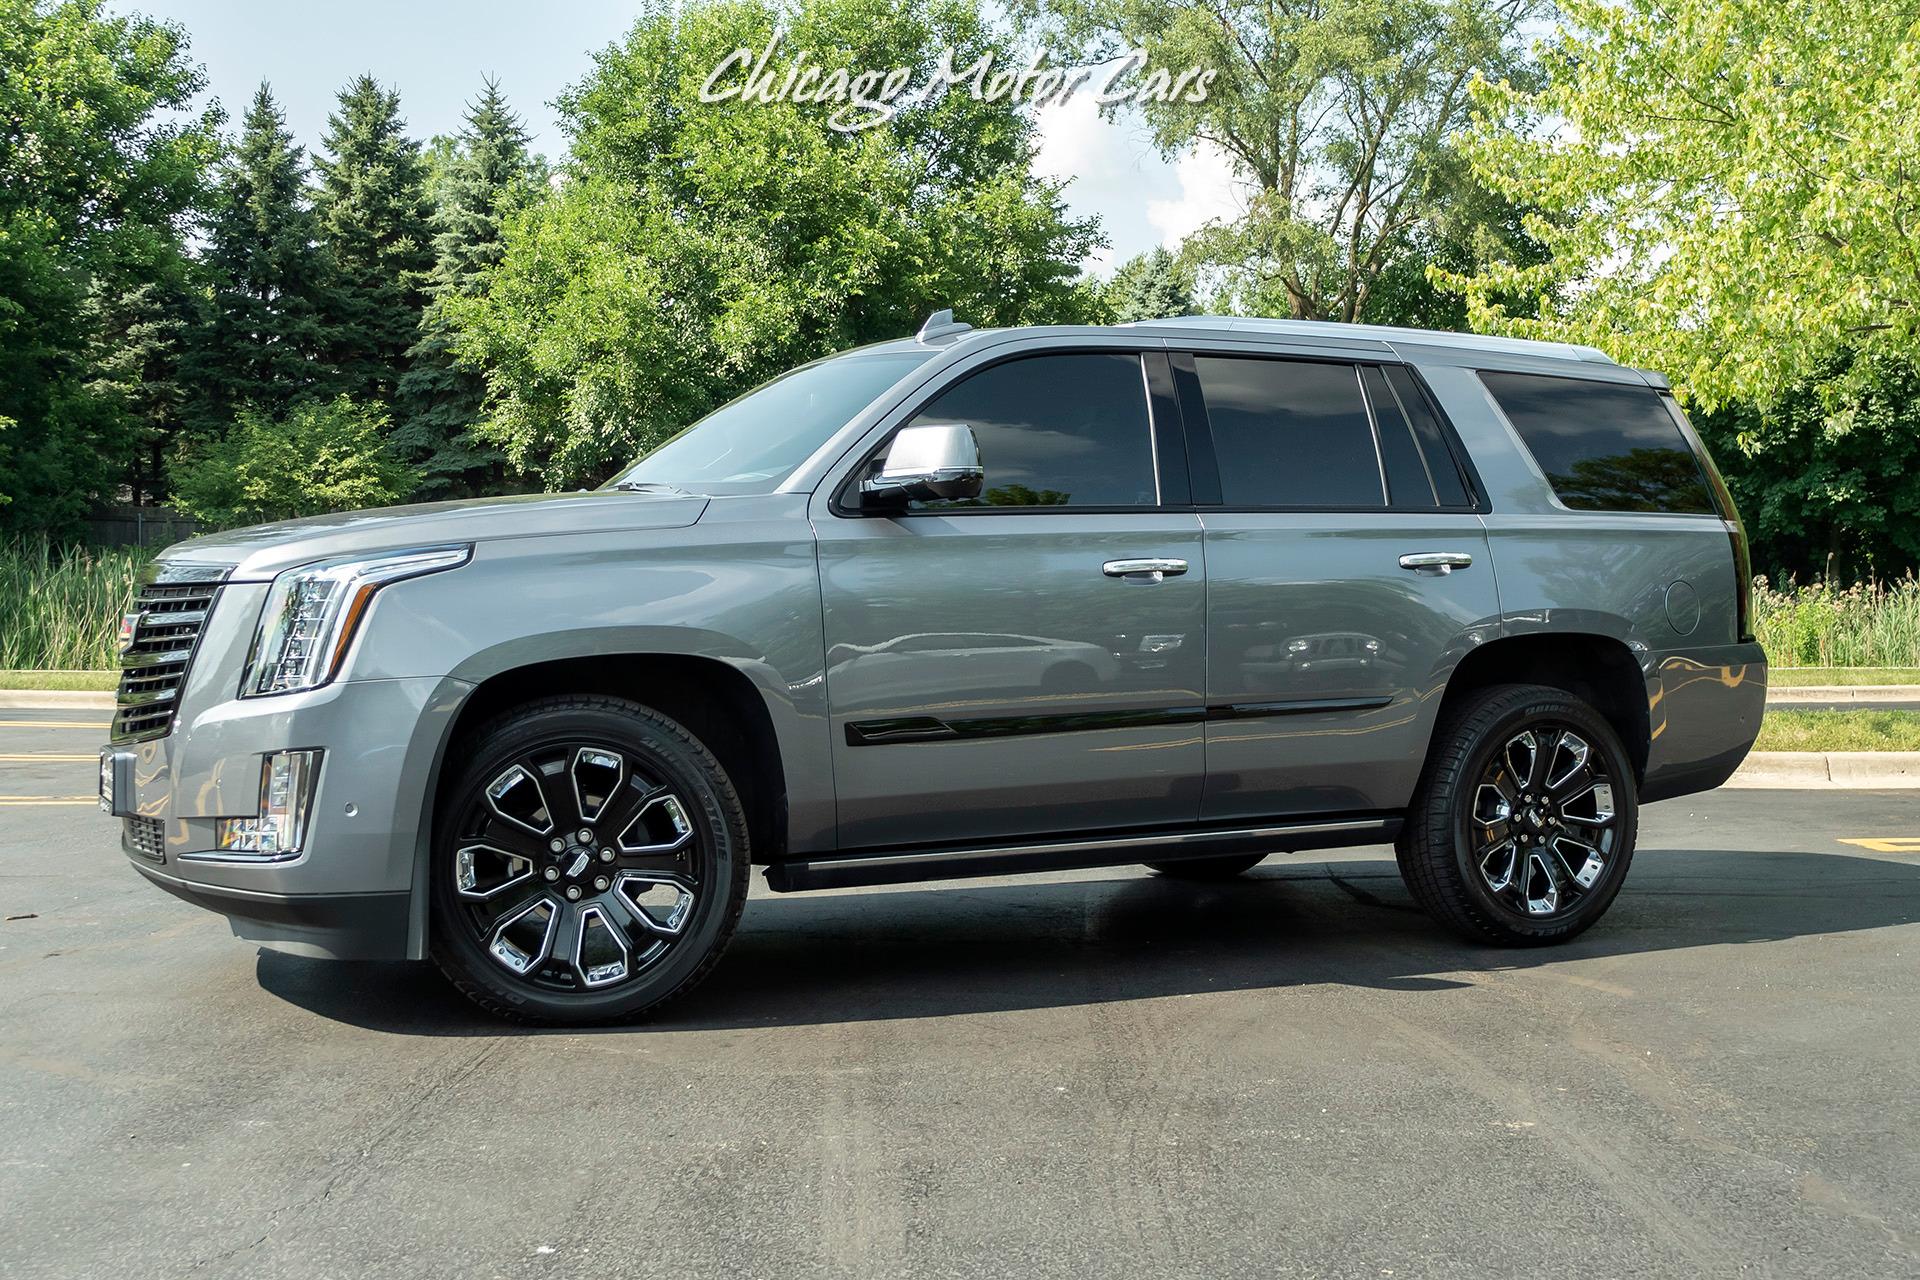 2020 Cadillac Escalade Platinum Sport Edition! $99k+MSRP ...